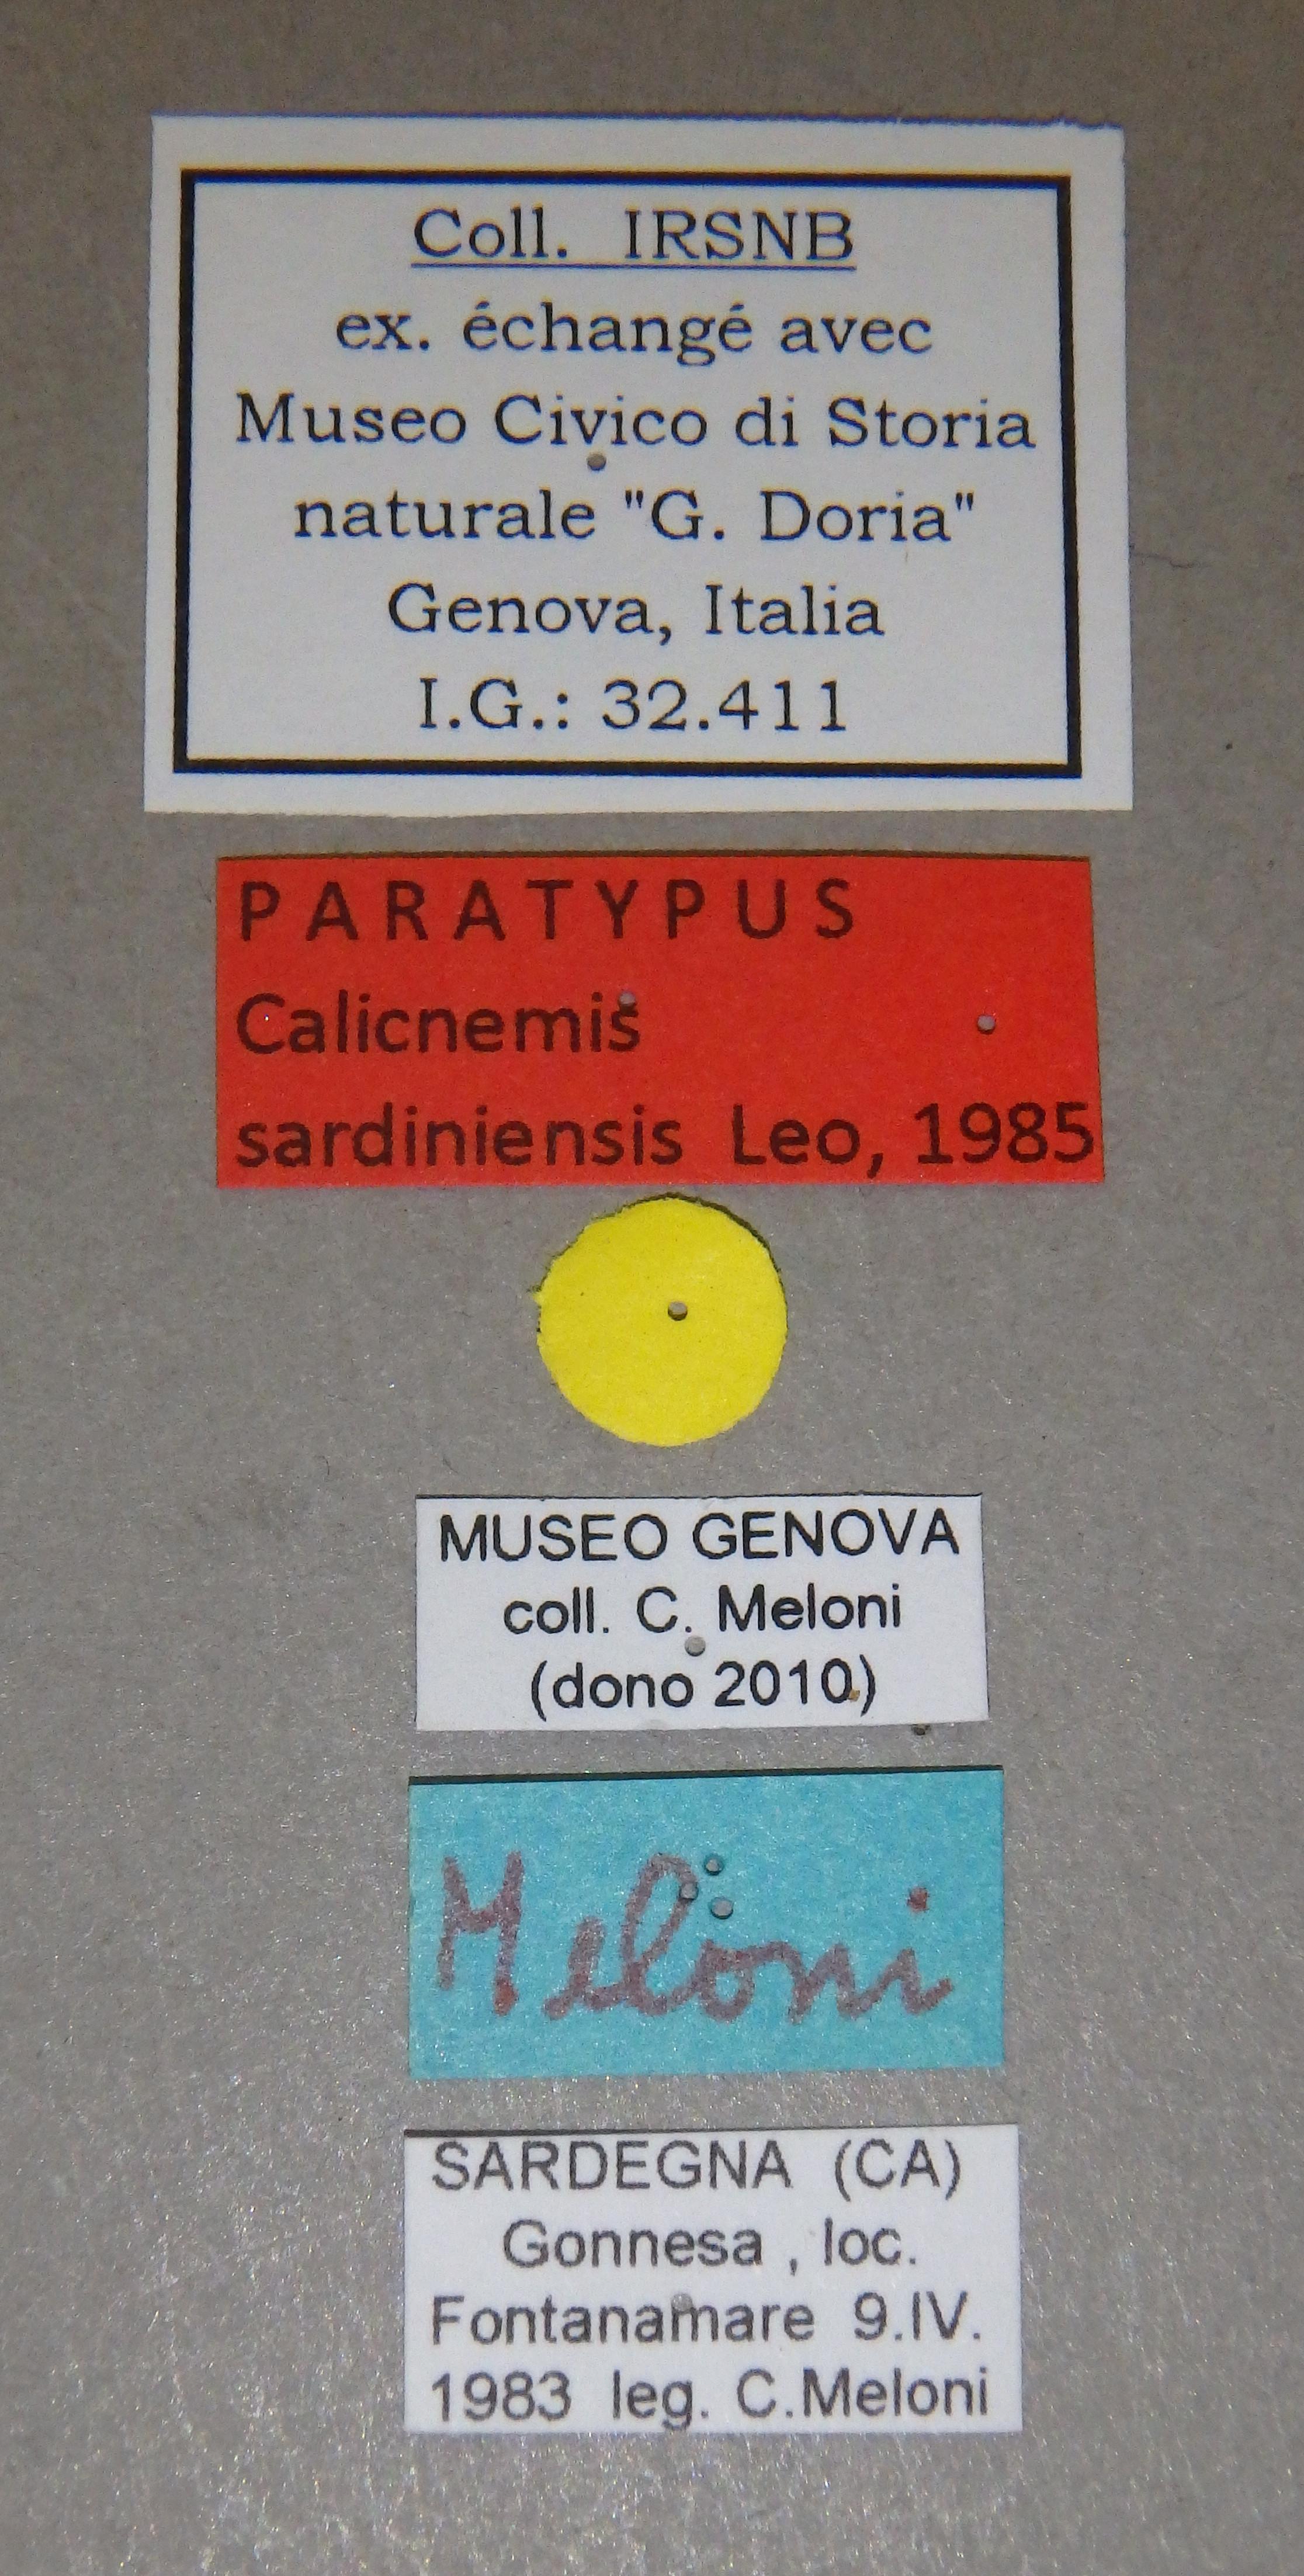 Calicnemis sardiniensis pt Lb.JPG